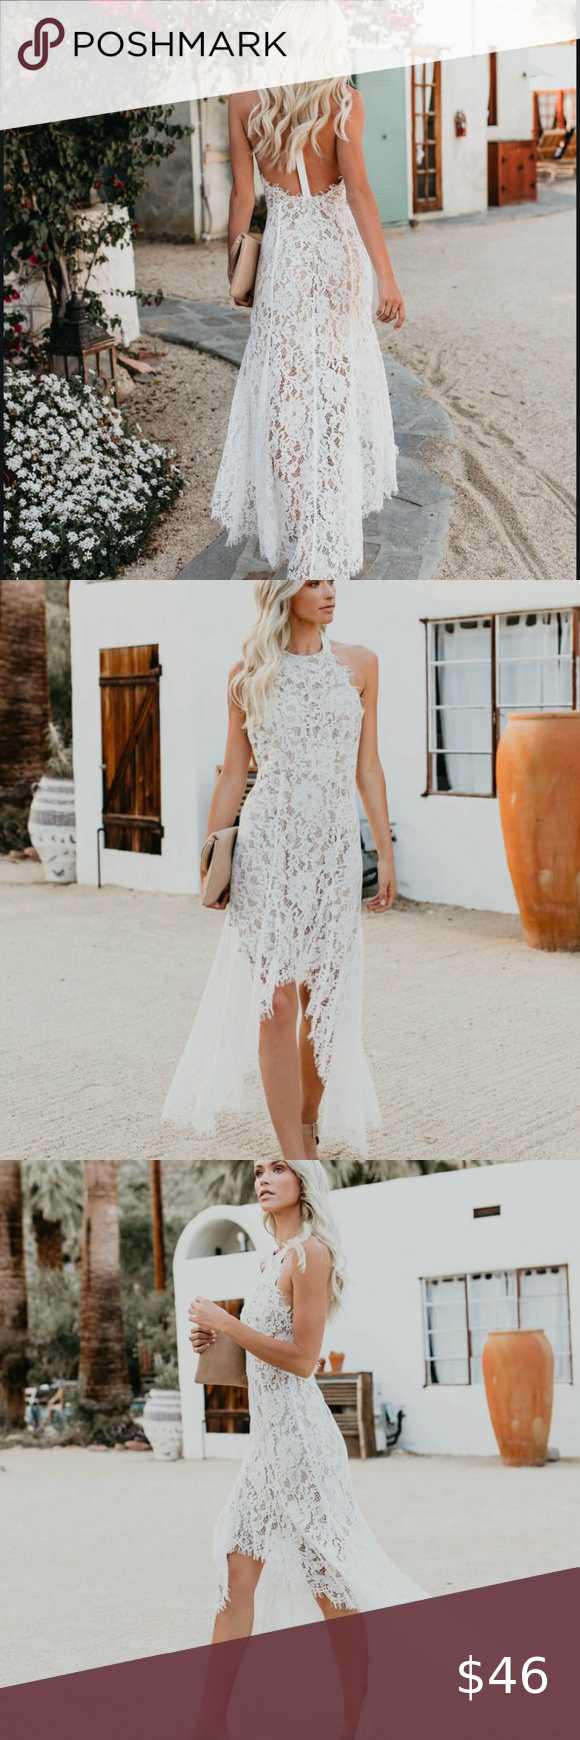 High Low White Lace Dress Lace White Dress Lace Dress Dresses [ 1740 x 580 Pixel ]